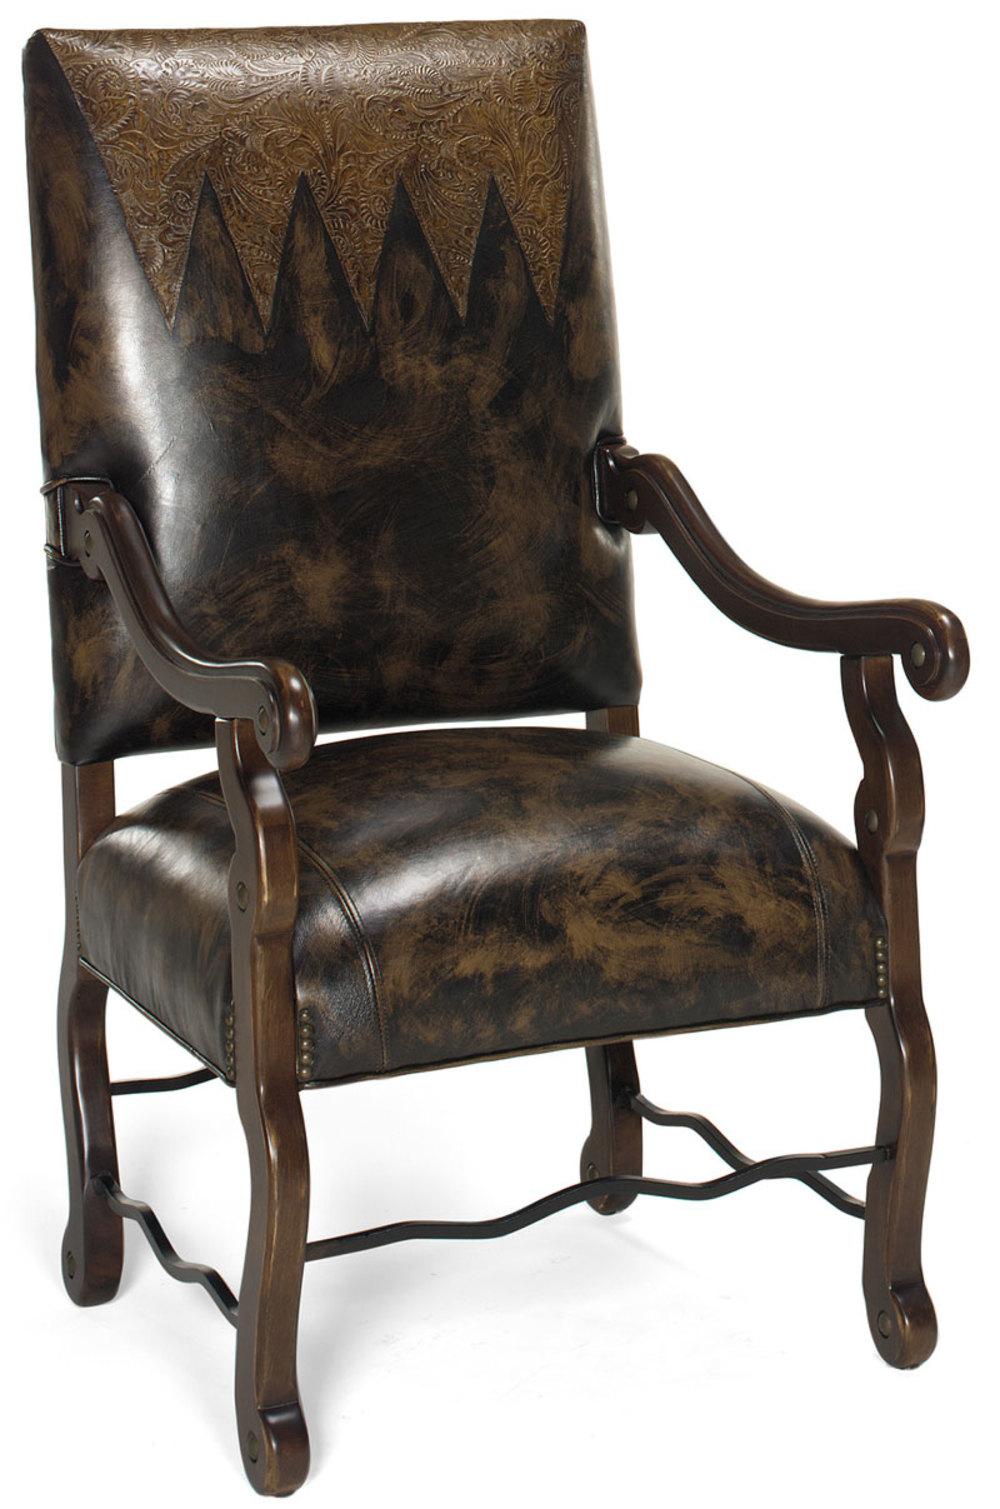 Parker Southern - Walker Chair